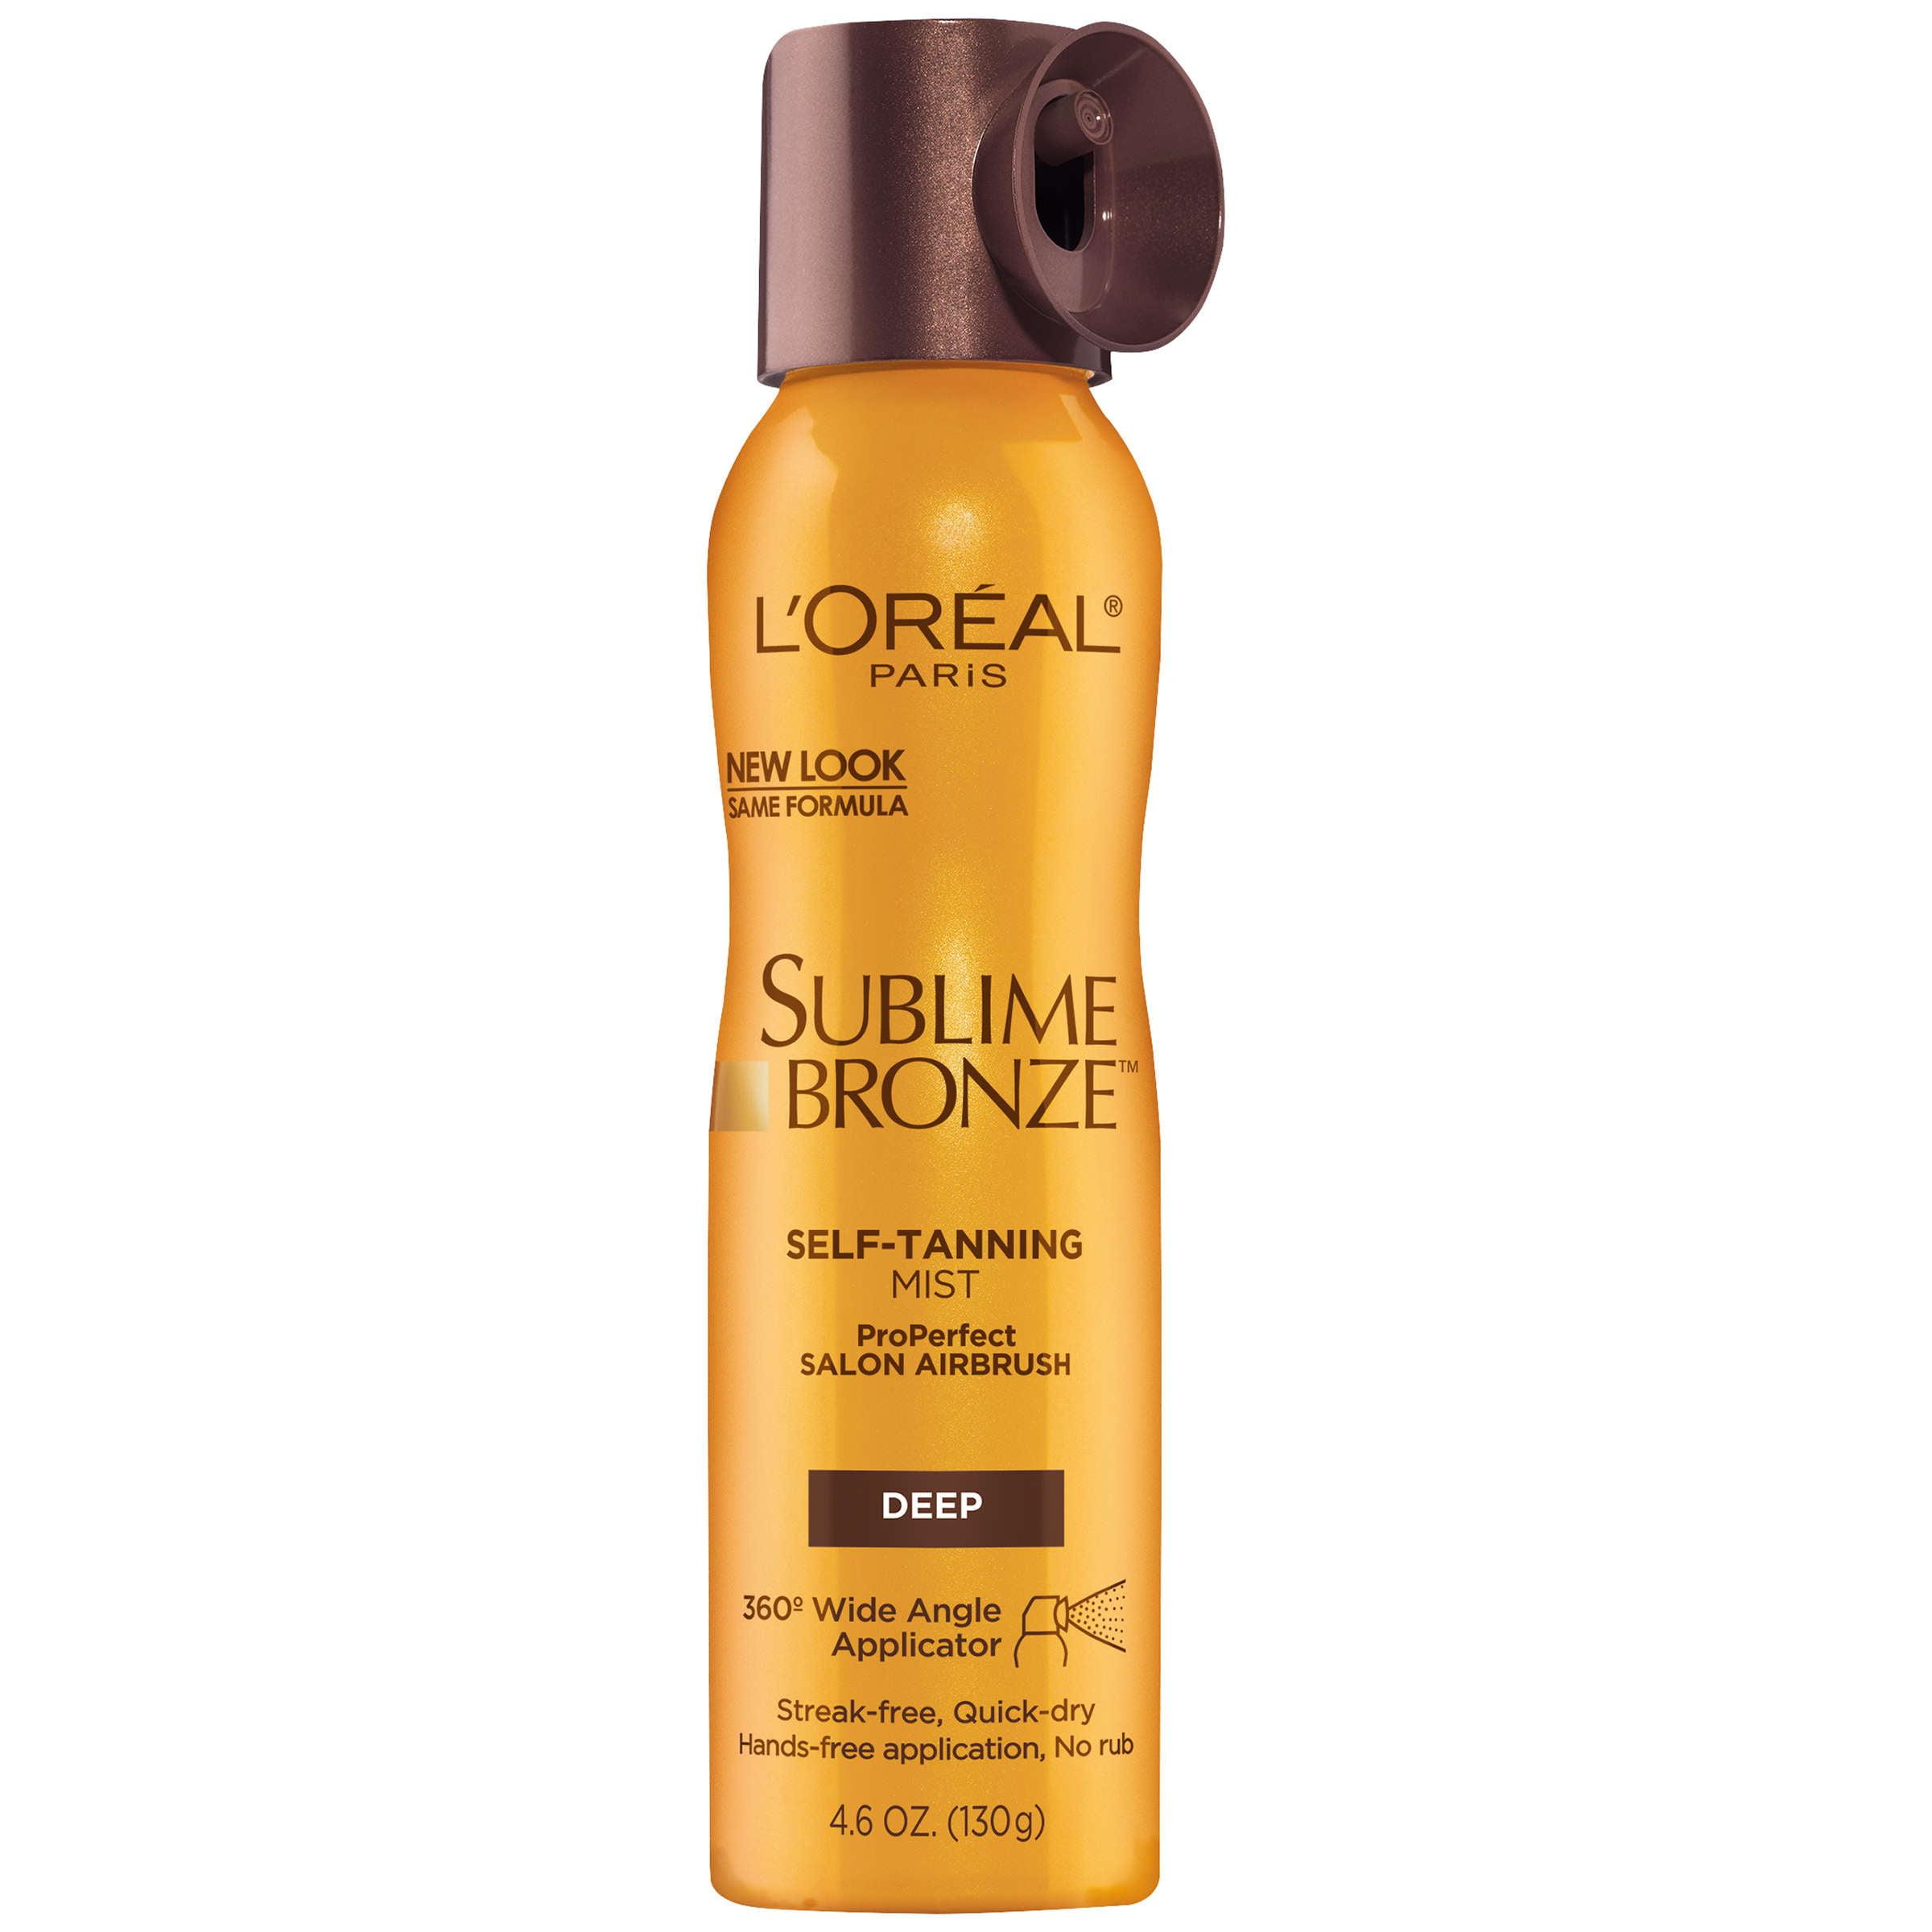 L'Oreal Paris Sublime Bronze Self-Tanning Mist, Deep Natural Tan, 4.6 Oz